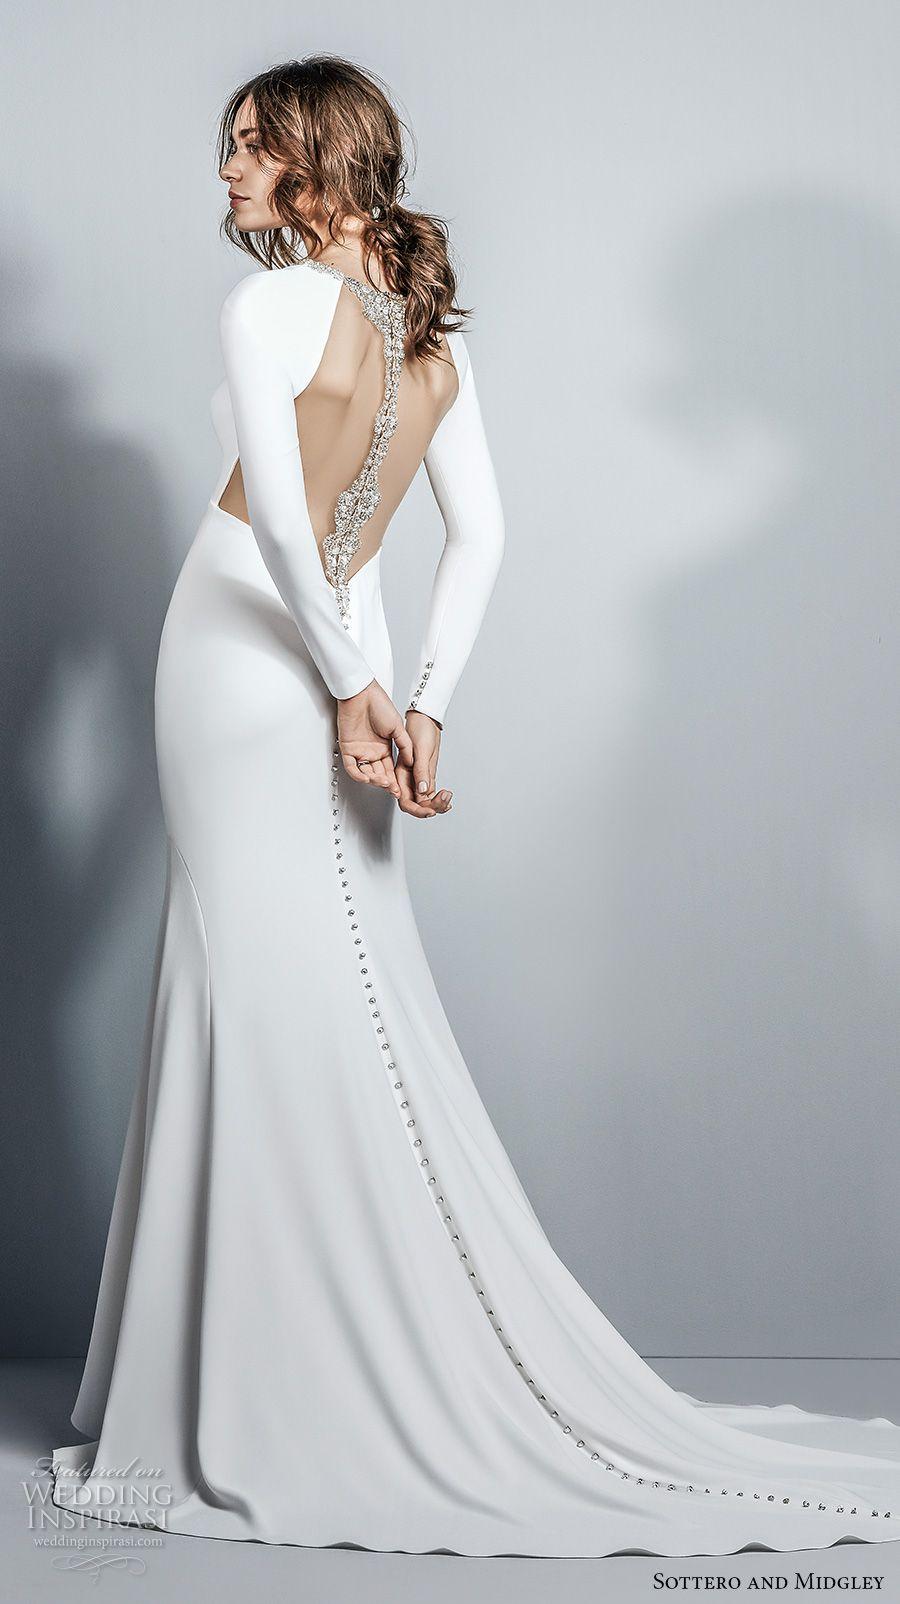 Sottero and midgley fall wedding dresses u ucgraysonud bridal